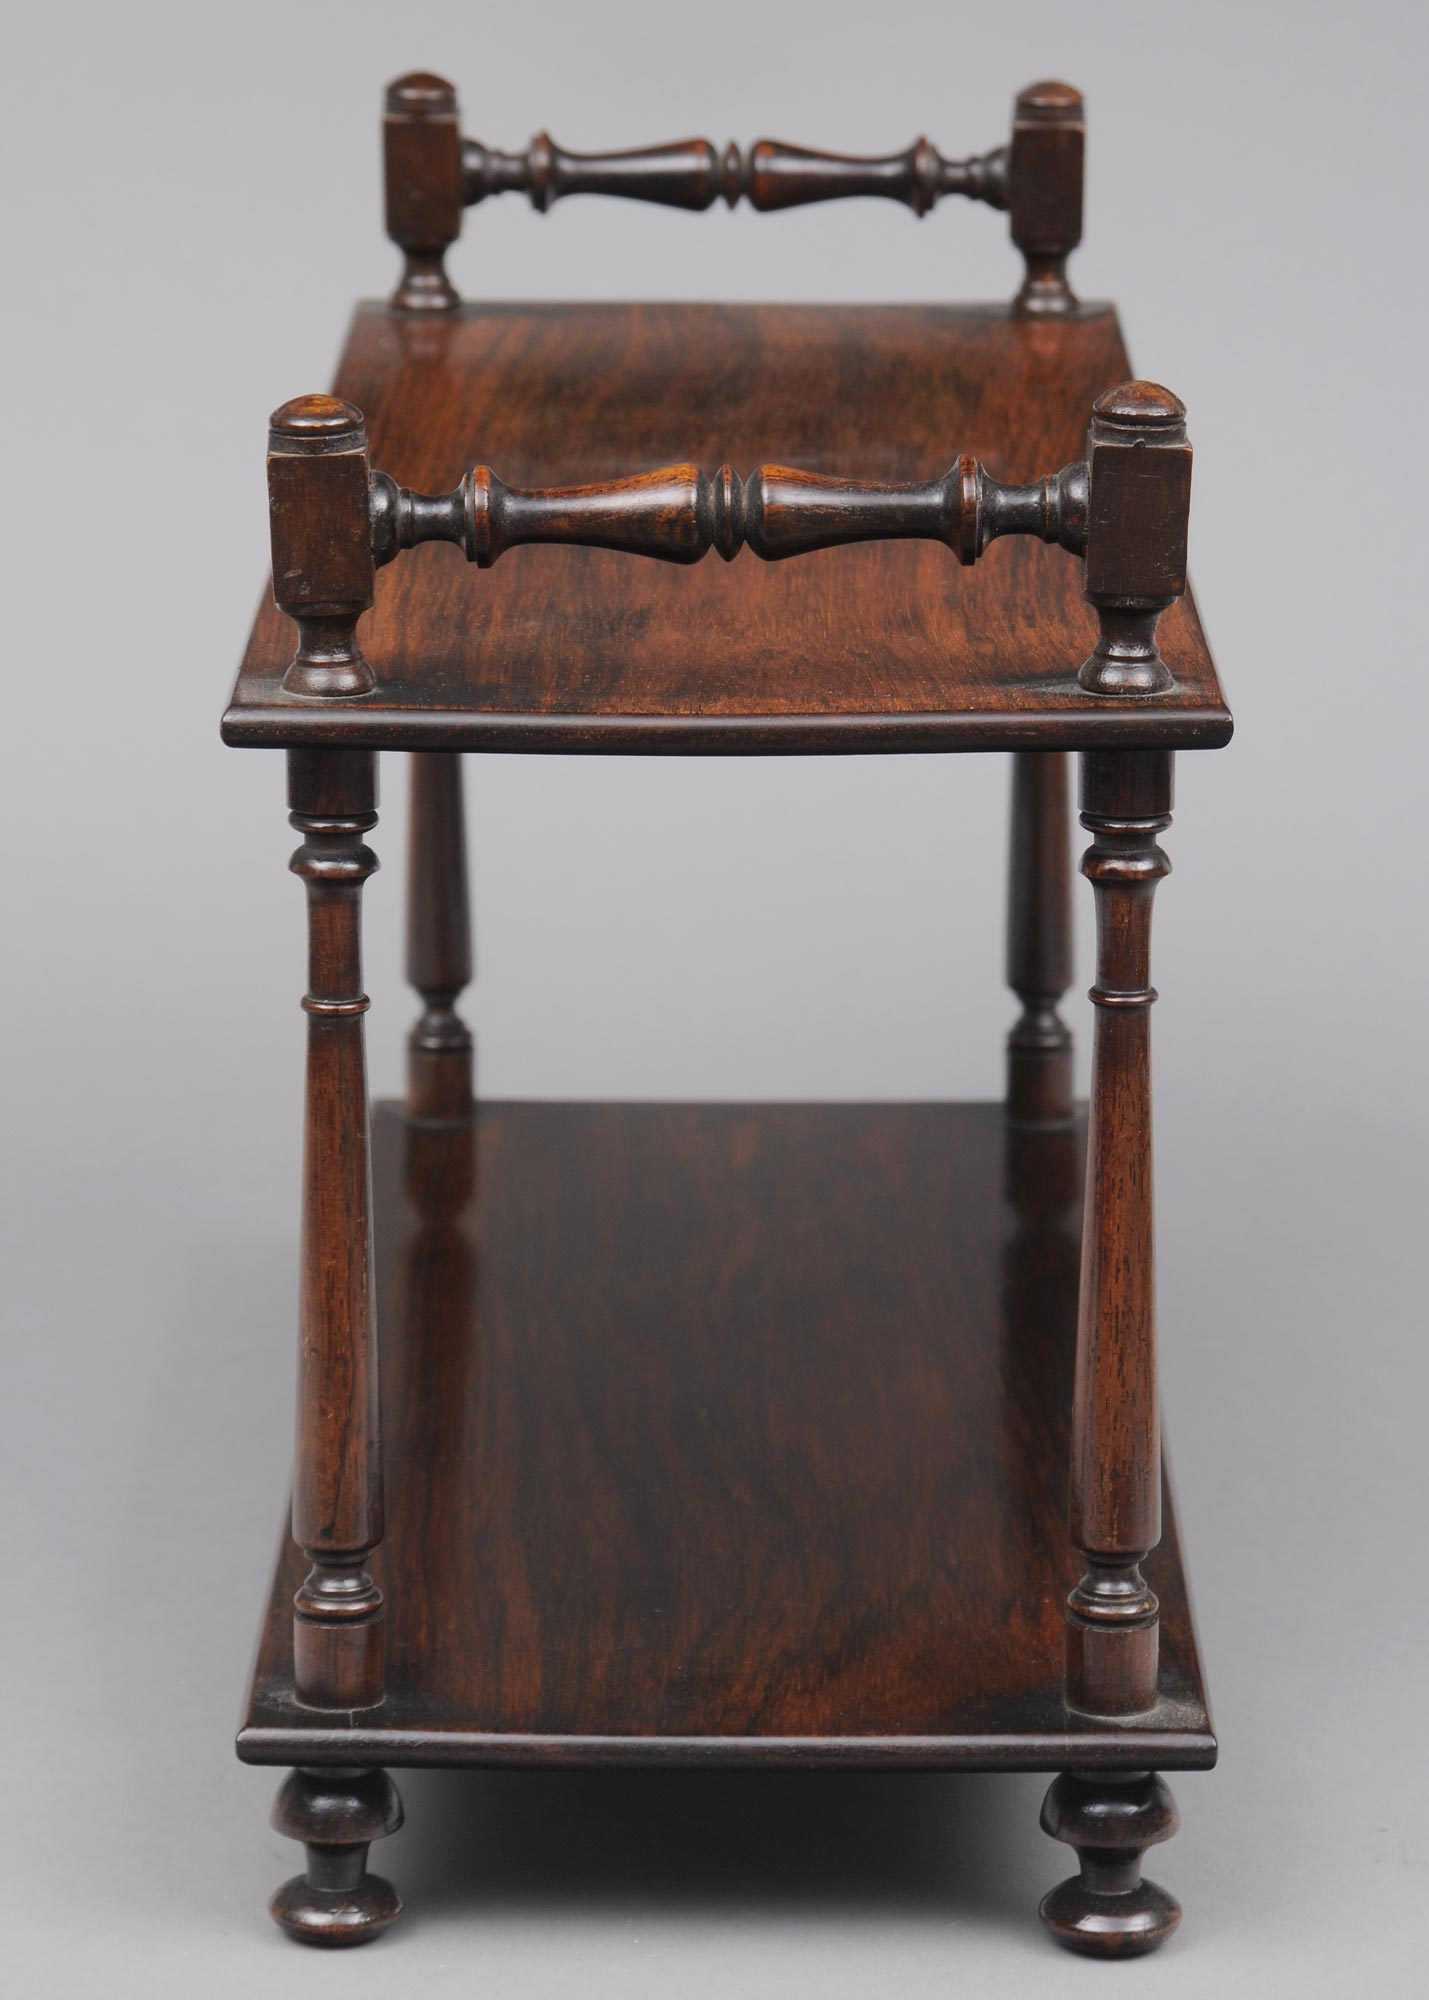 Regency Rosewood Desk Bookstand Circa 1810